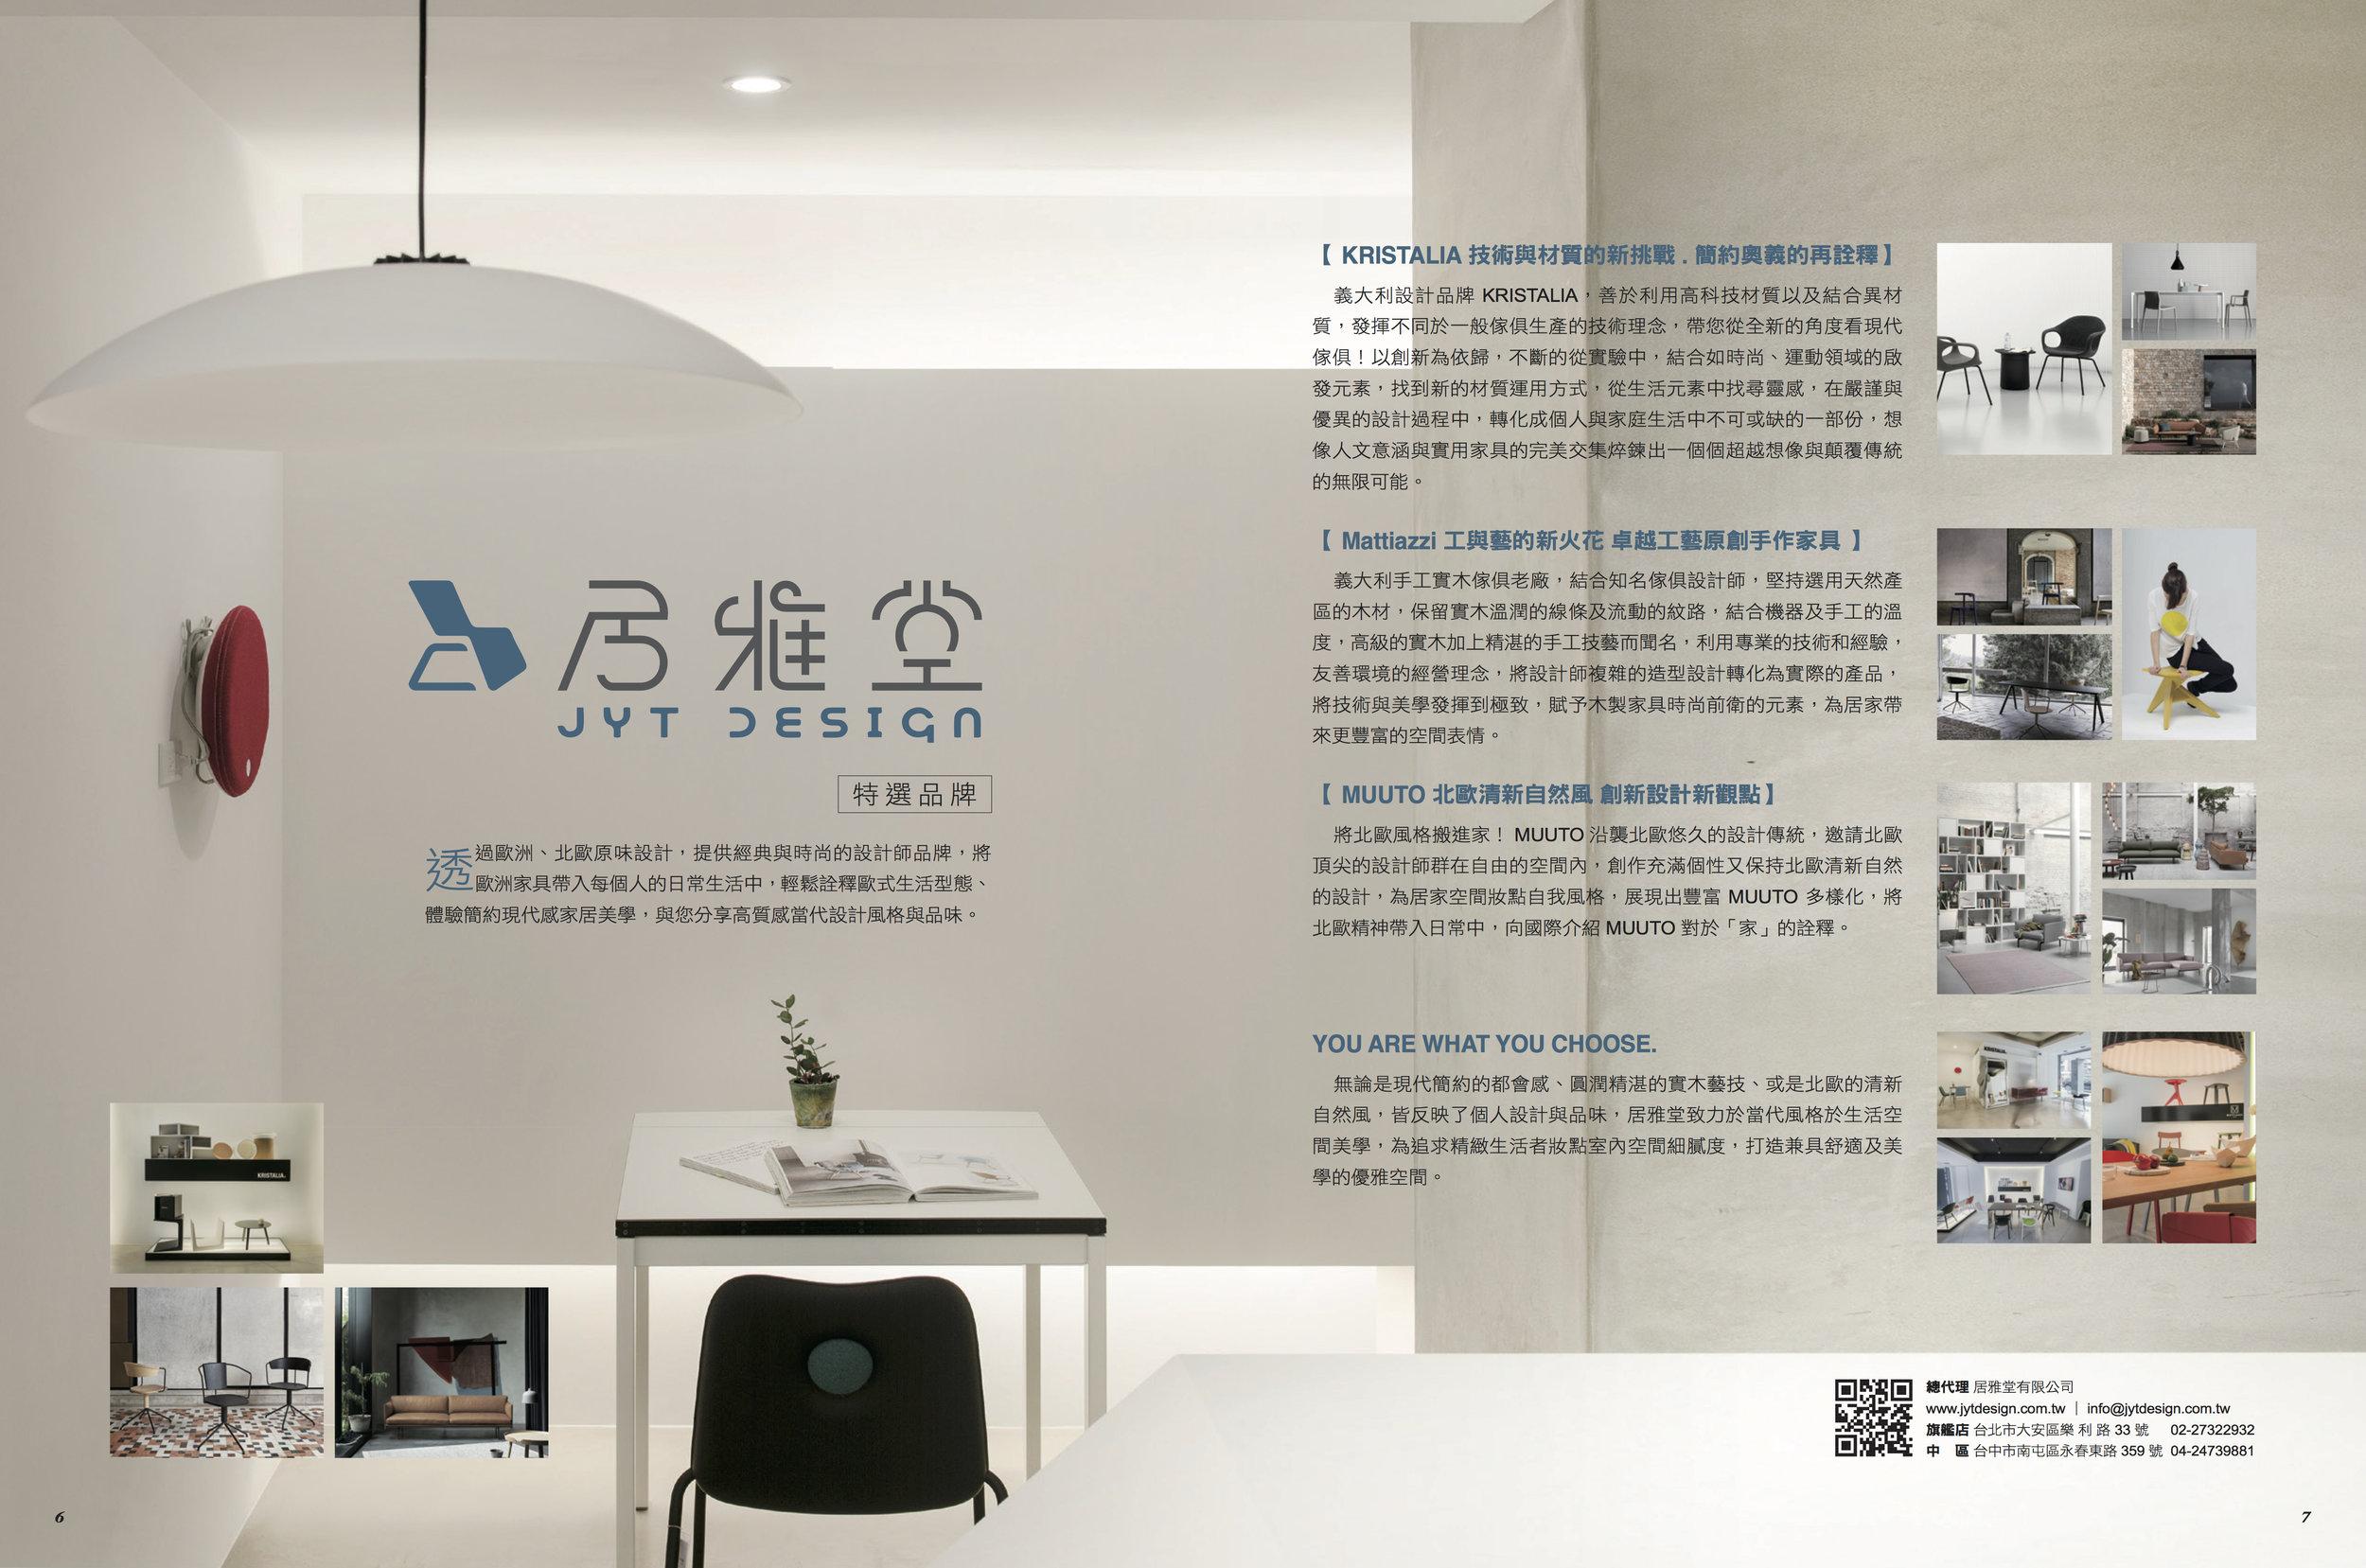 AD3-居雅堂-3校稿.jpg